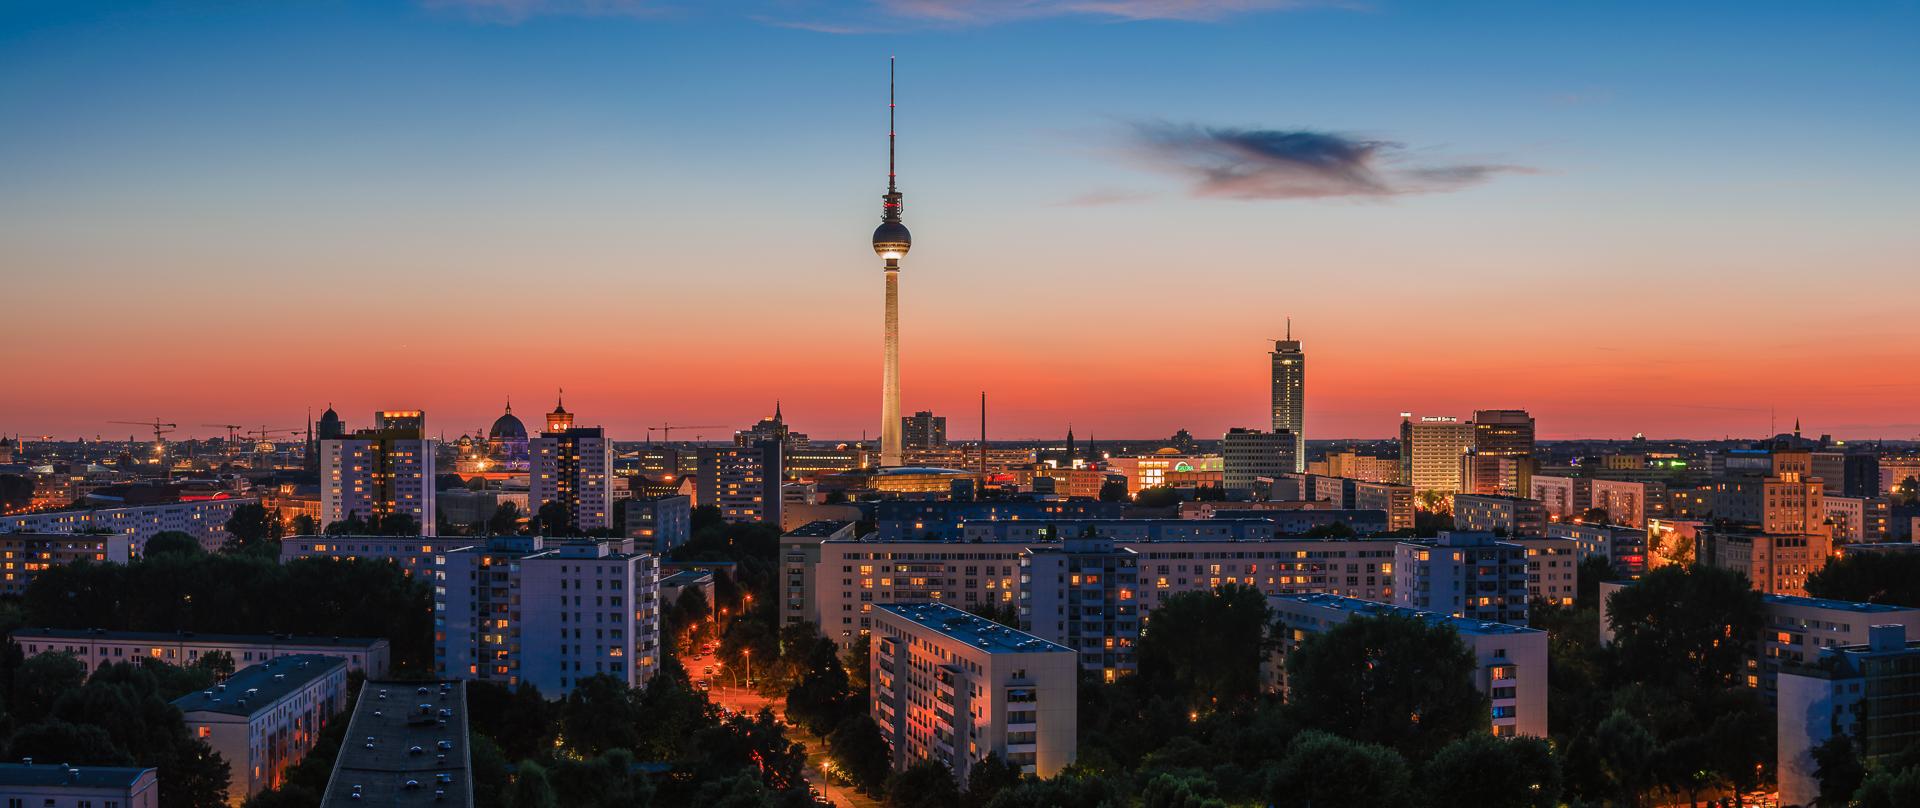 Skyline Berlins kurz nach Sonnenuntergang als Panorama.